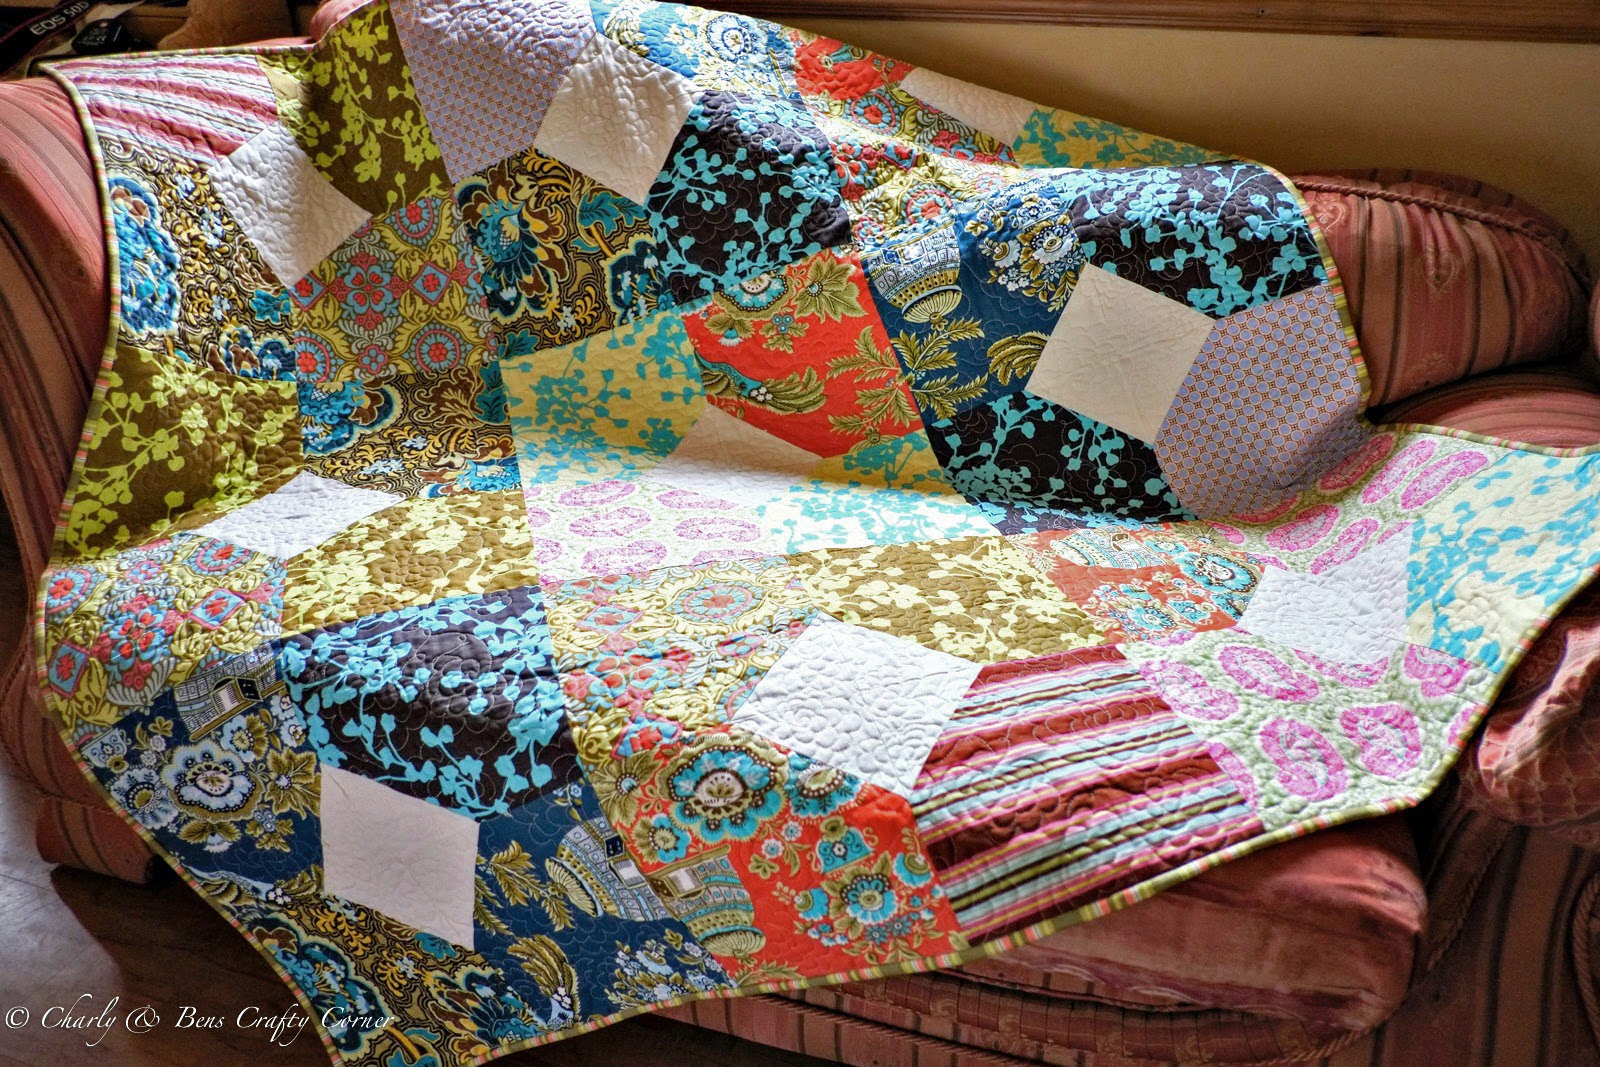 Charly & Ben's Crafty Corner: Layers of Charm, Fat Quarter Shop ... : fat quarters quilt shop - Adamdwight.com